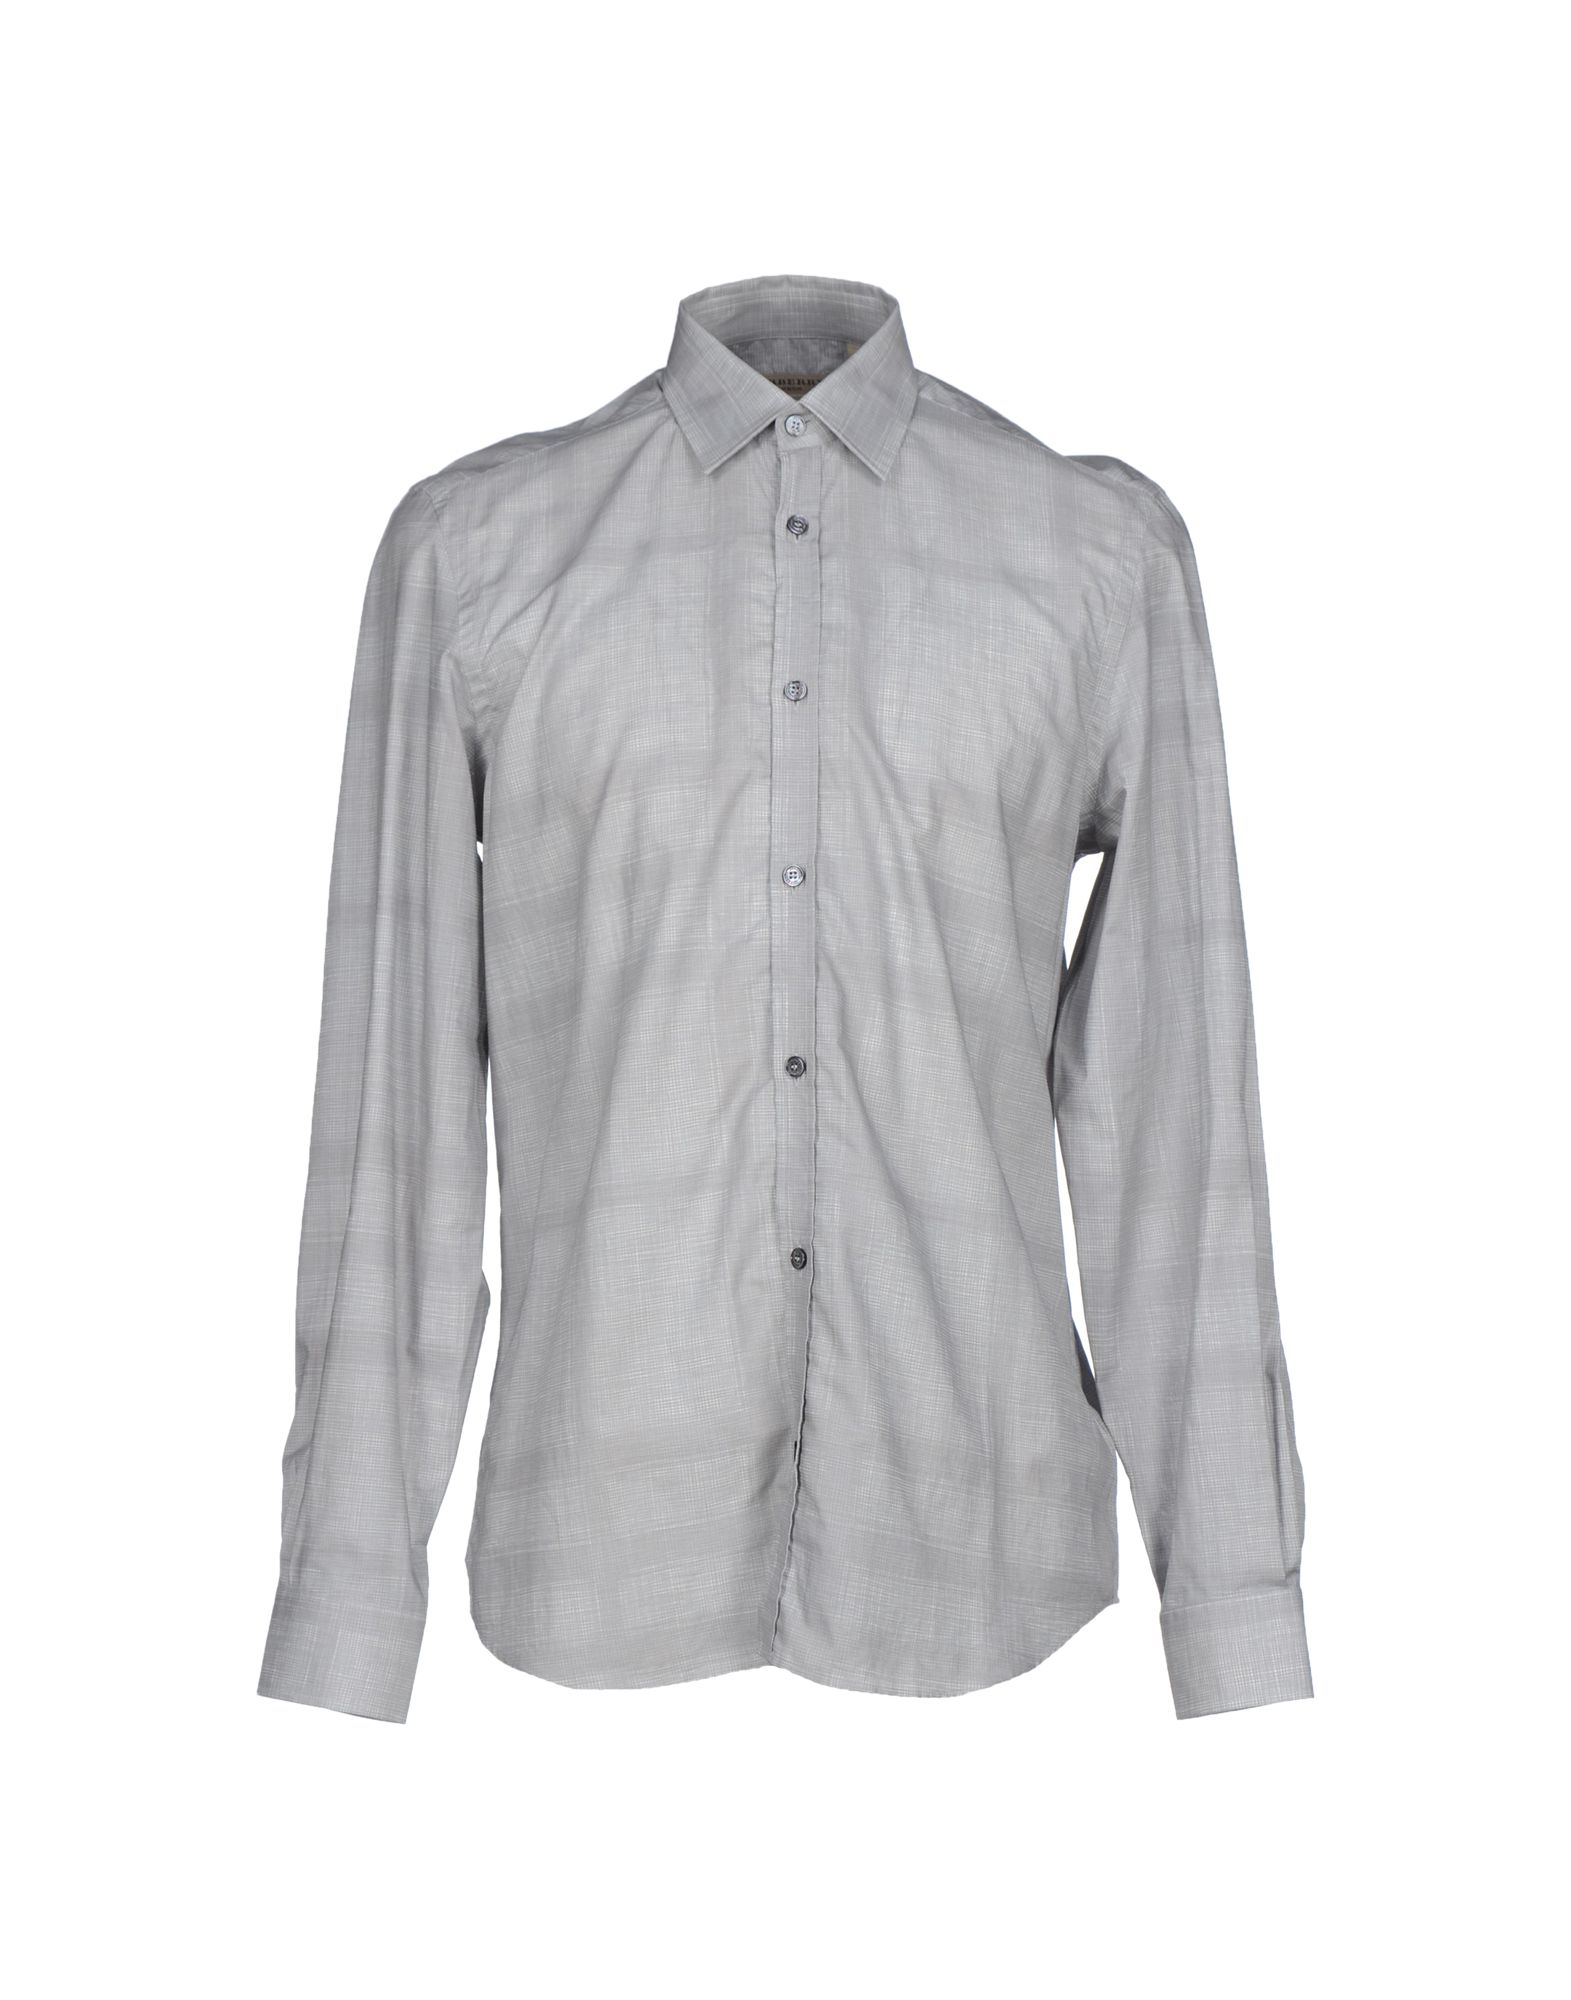 Burberry London Shirt In Gray For Men Grey